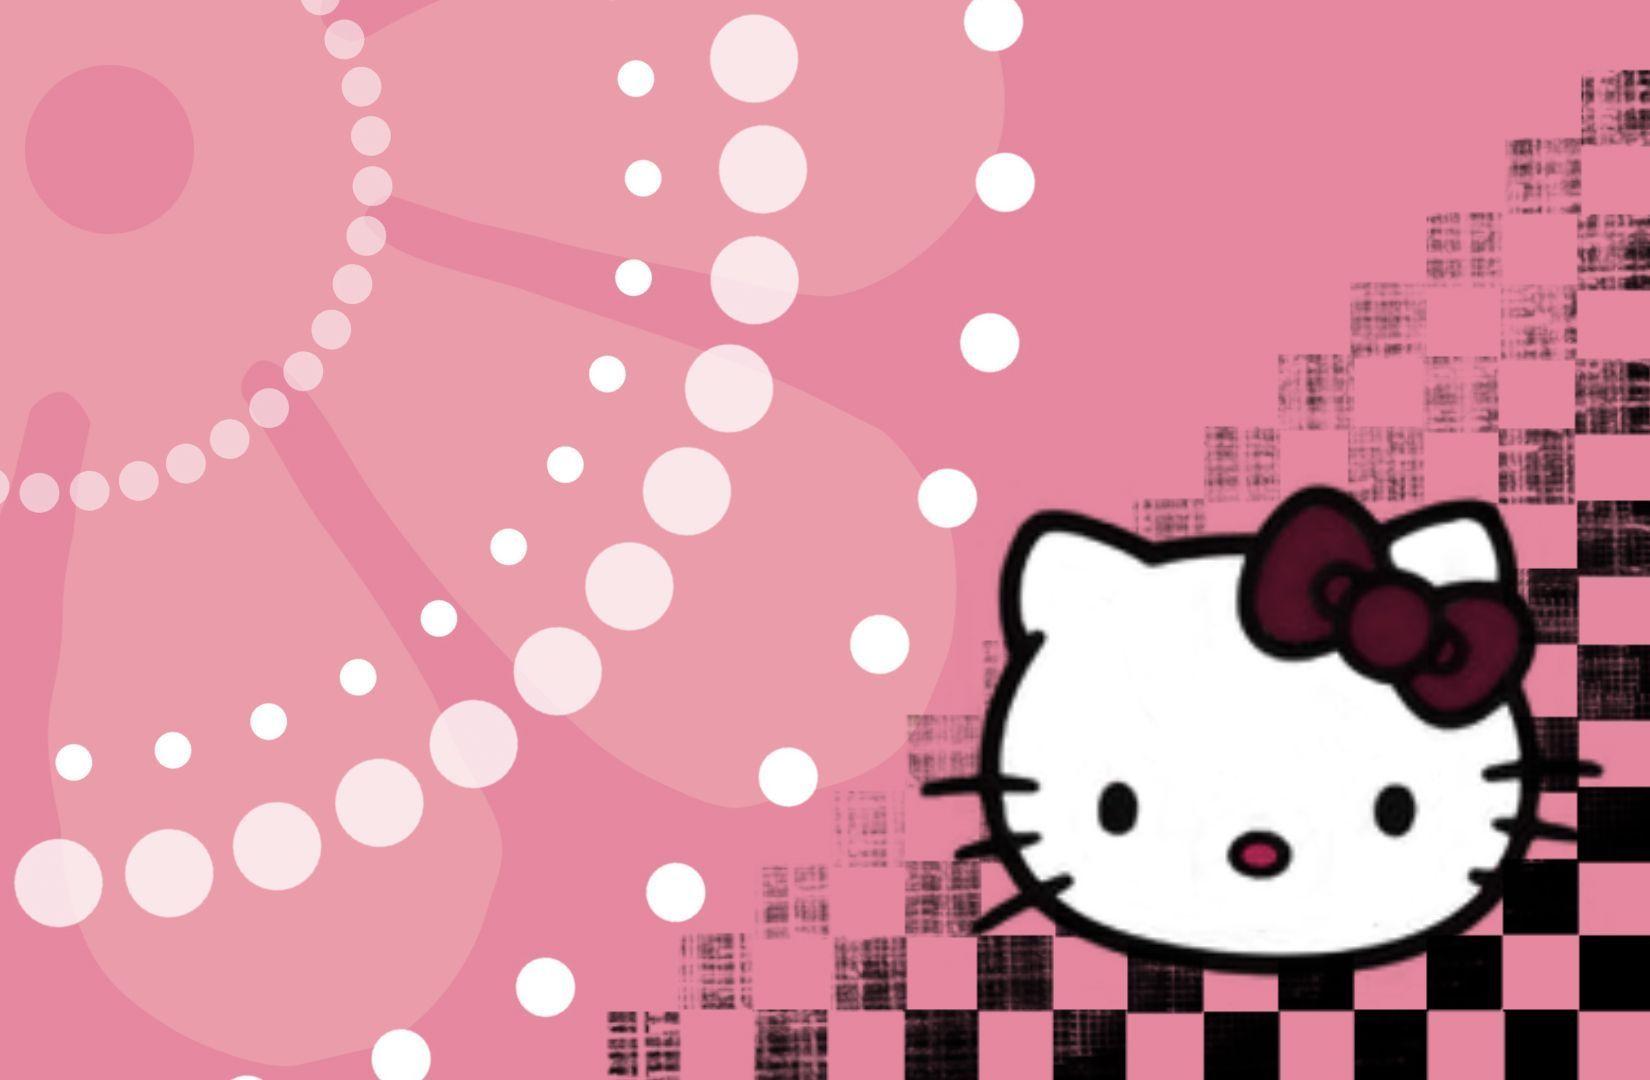 Download Wallpaper Hello Kitty Design - 6b9249163a8b2824ee8cfbb7417238b6  Collection_585819.jpg